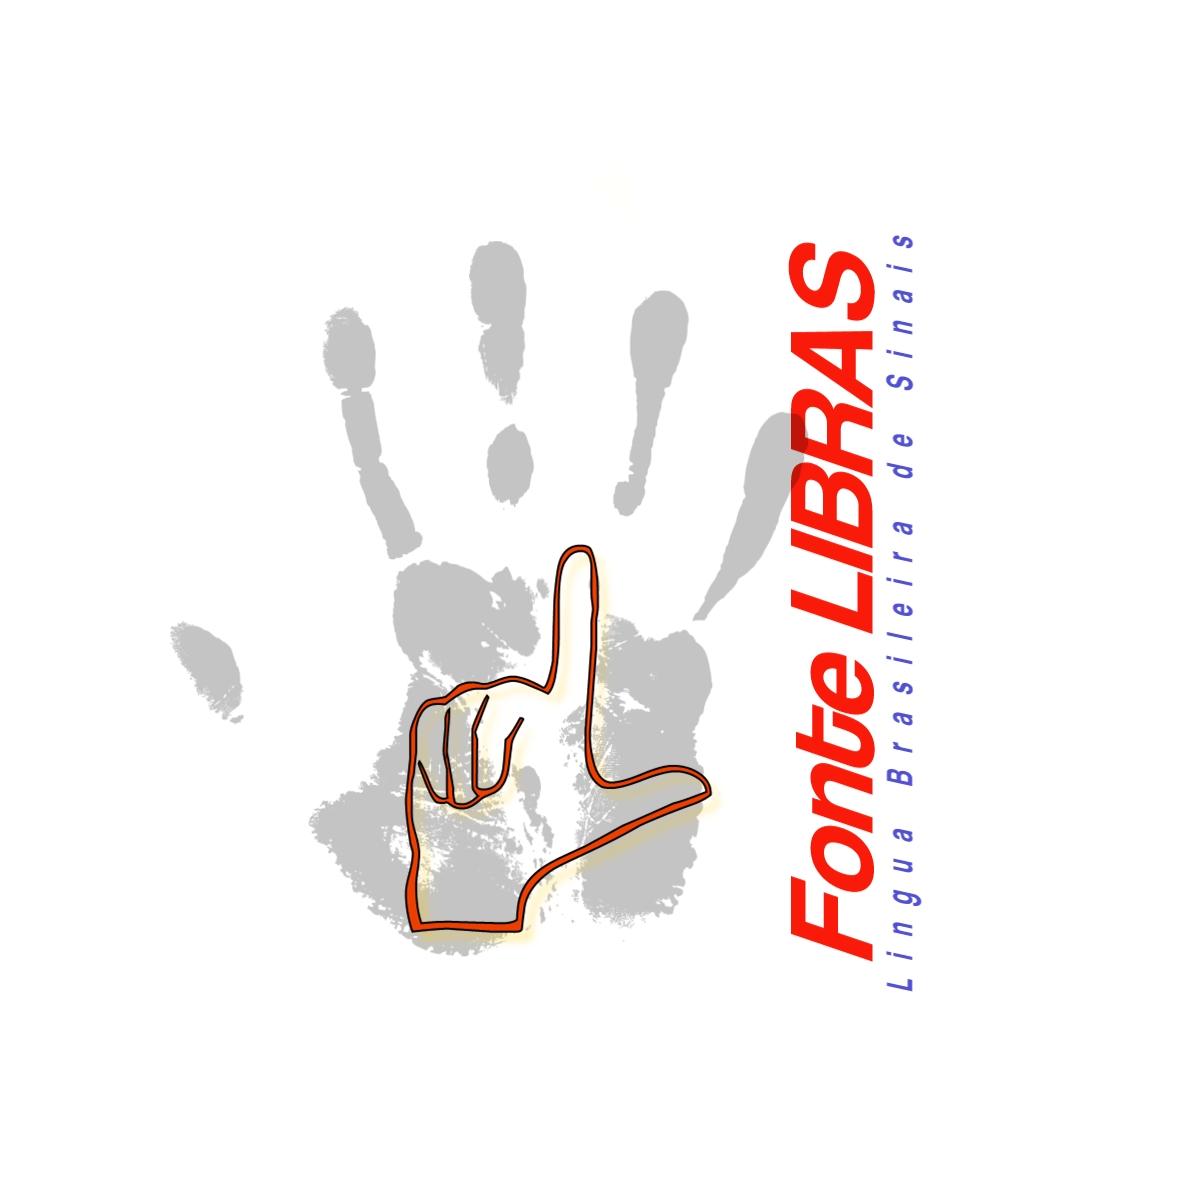 FONTE LIBRAS True Type